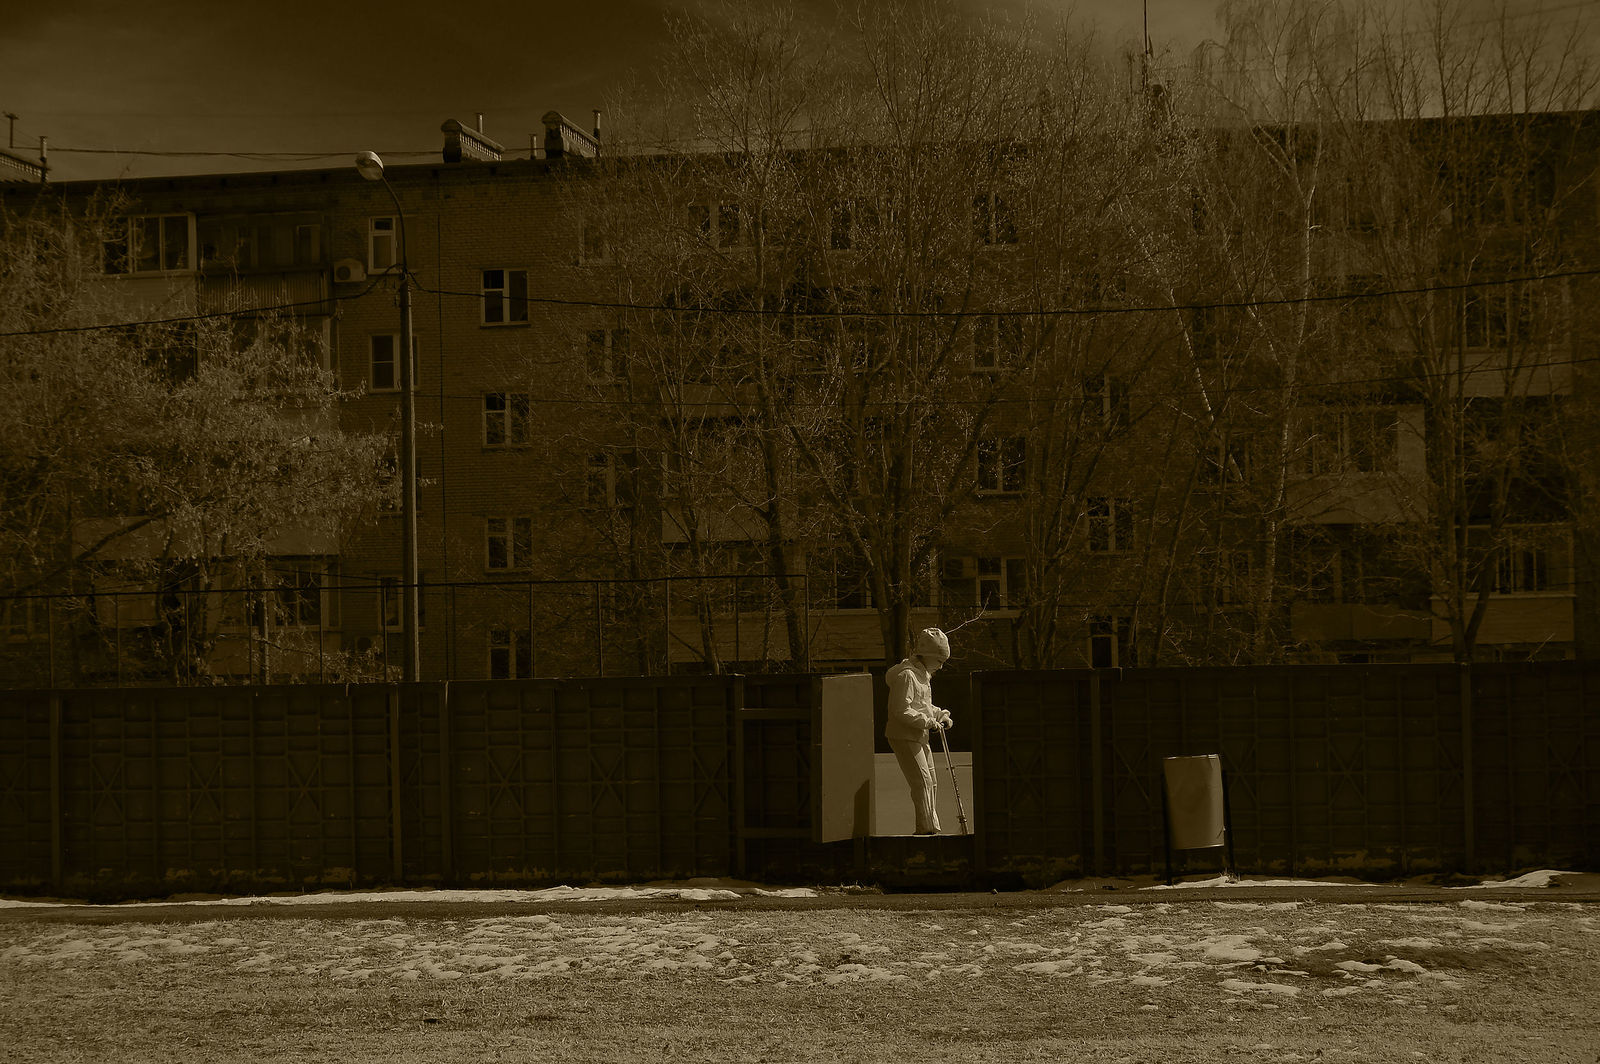 Николай Карташов. Инфра. DSC_0027